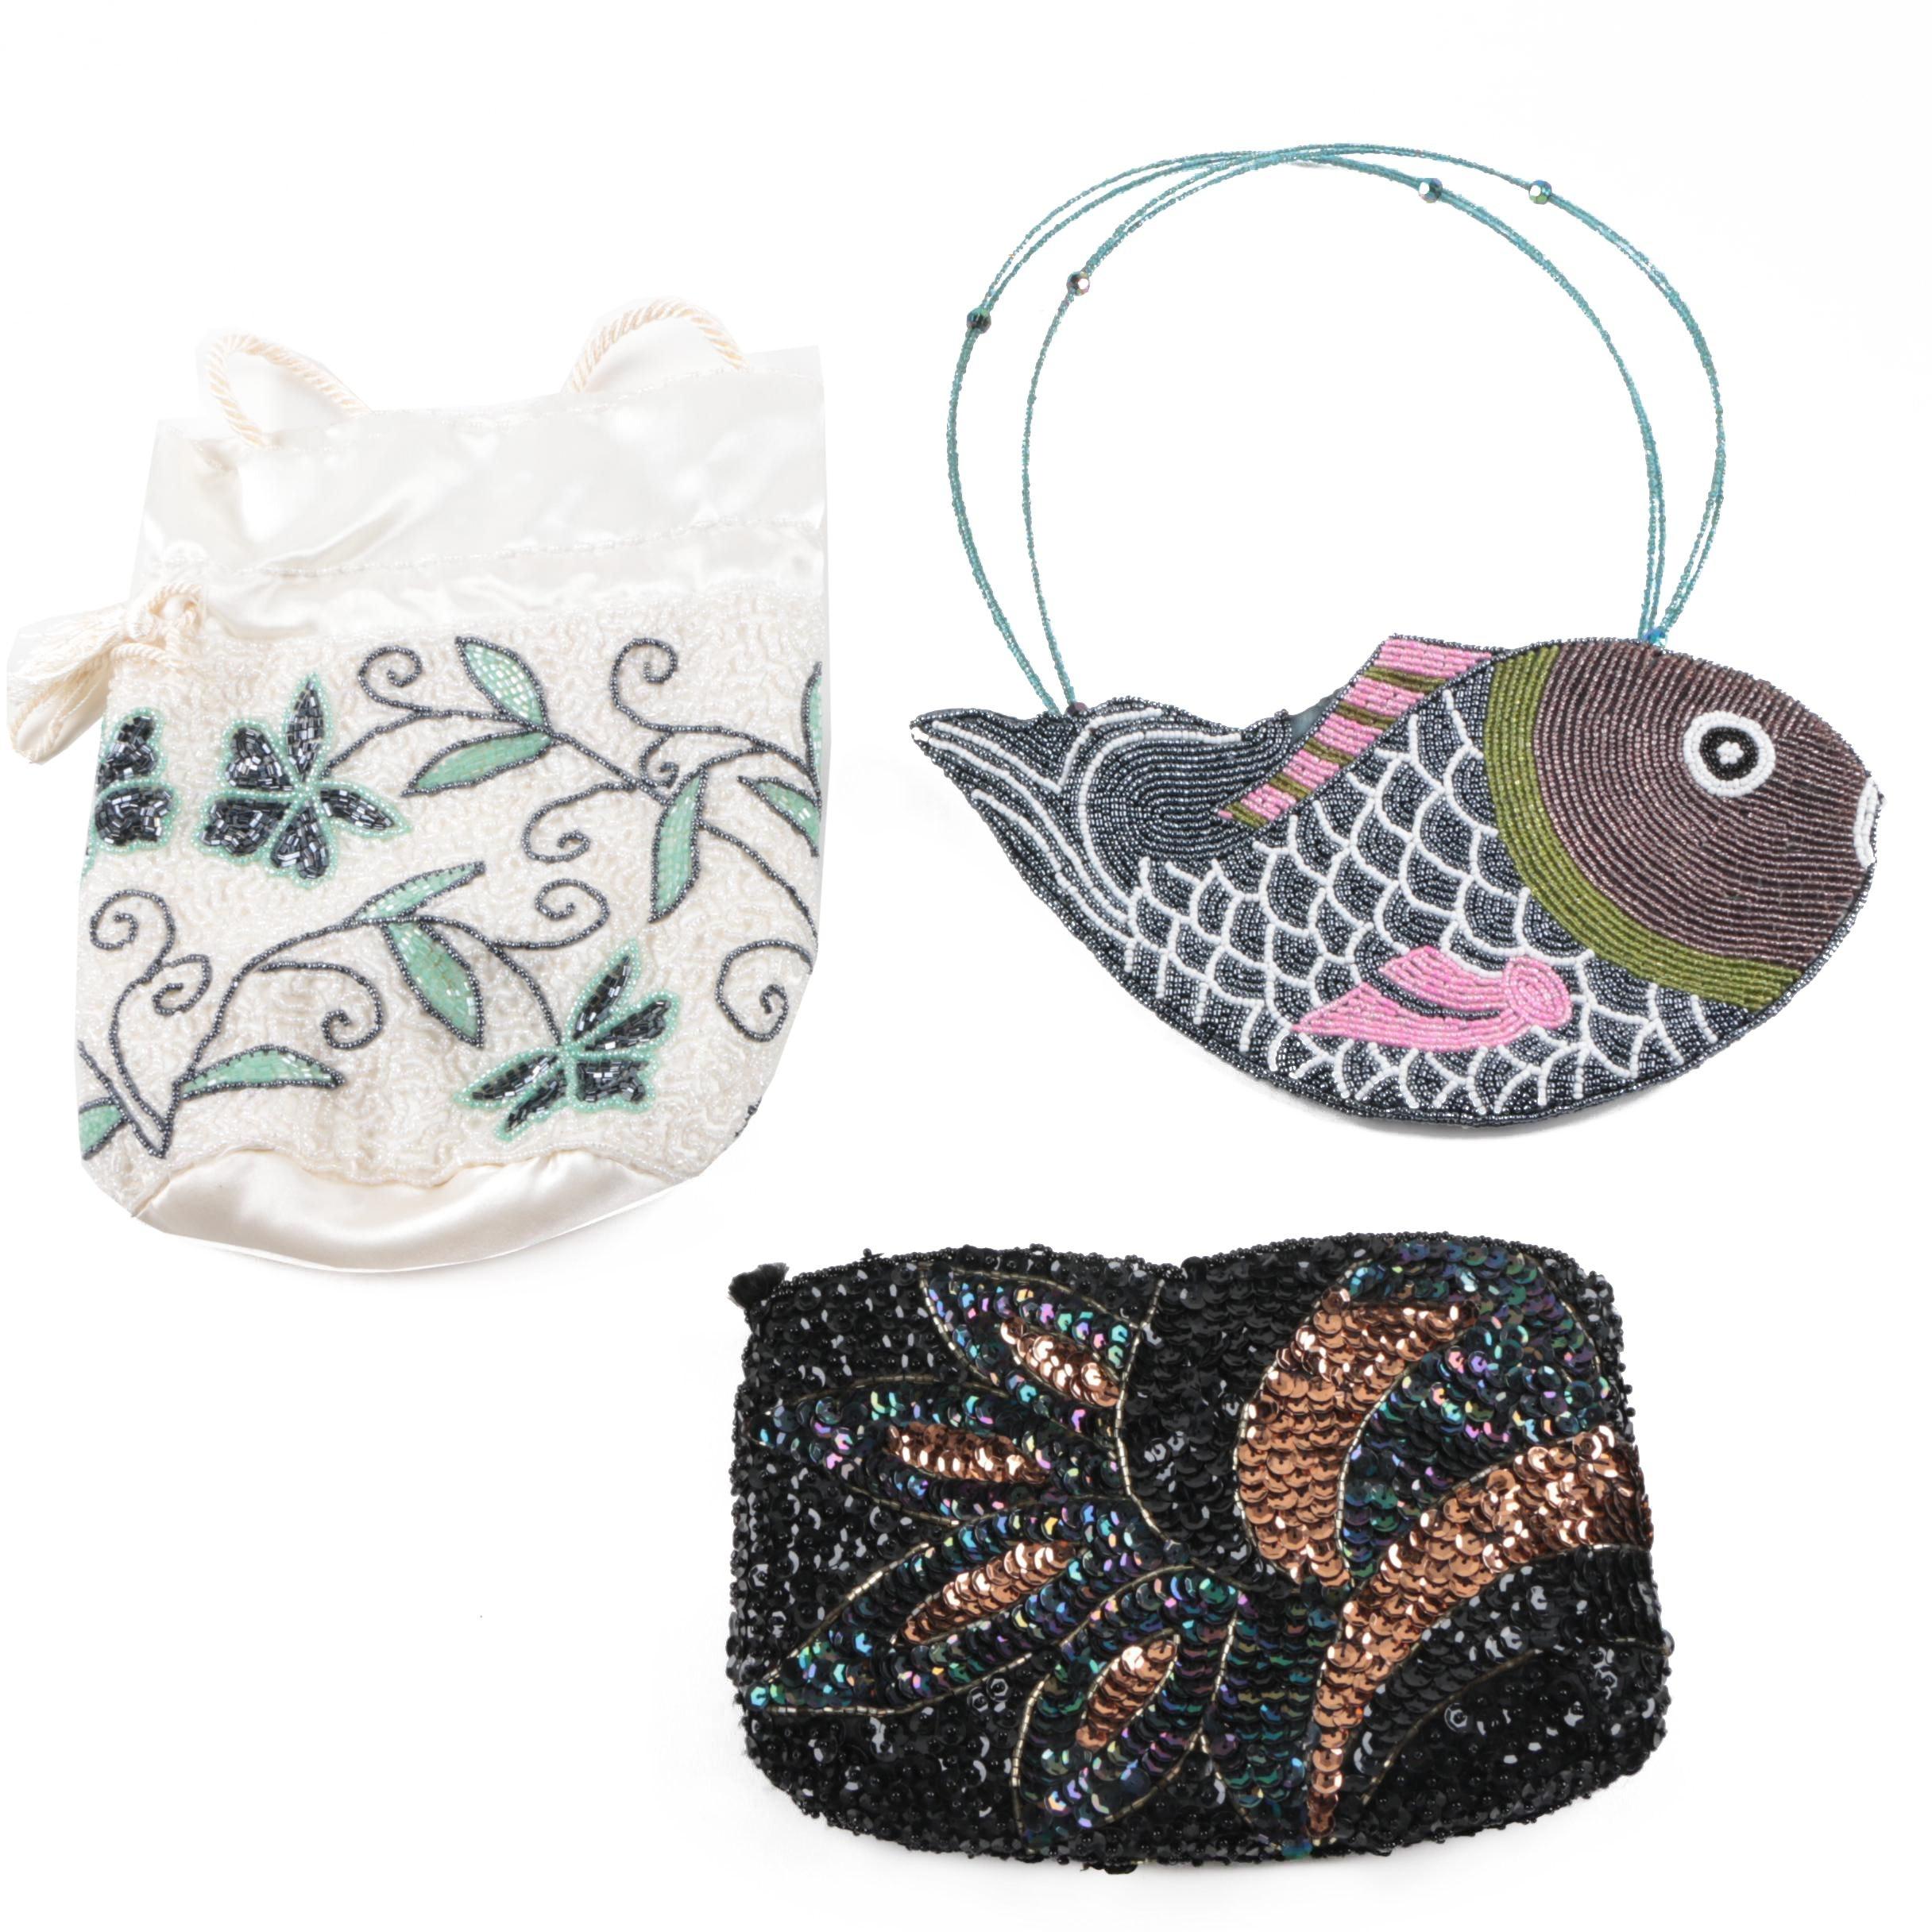 Embellished Occasion Handbags